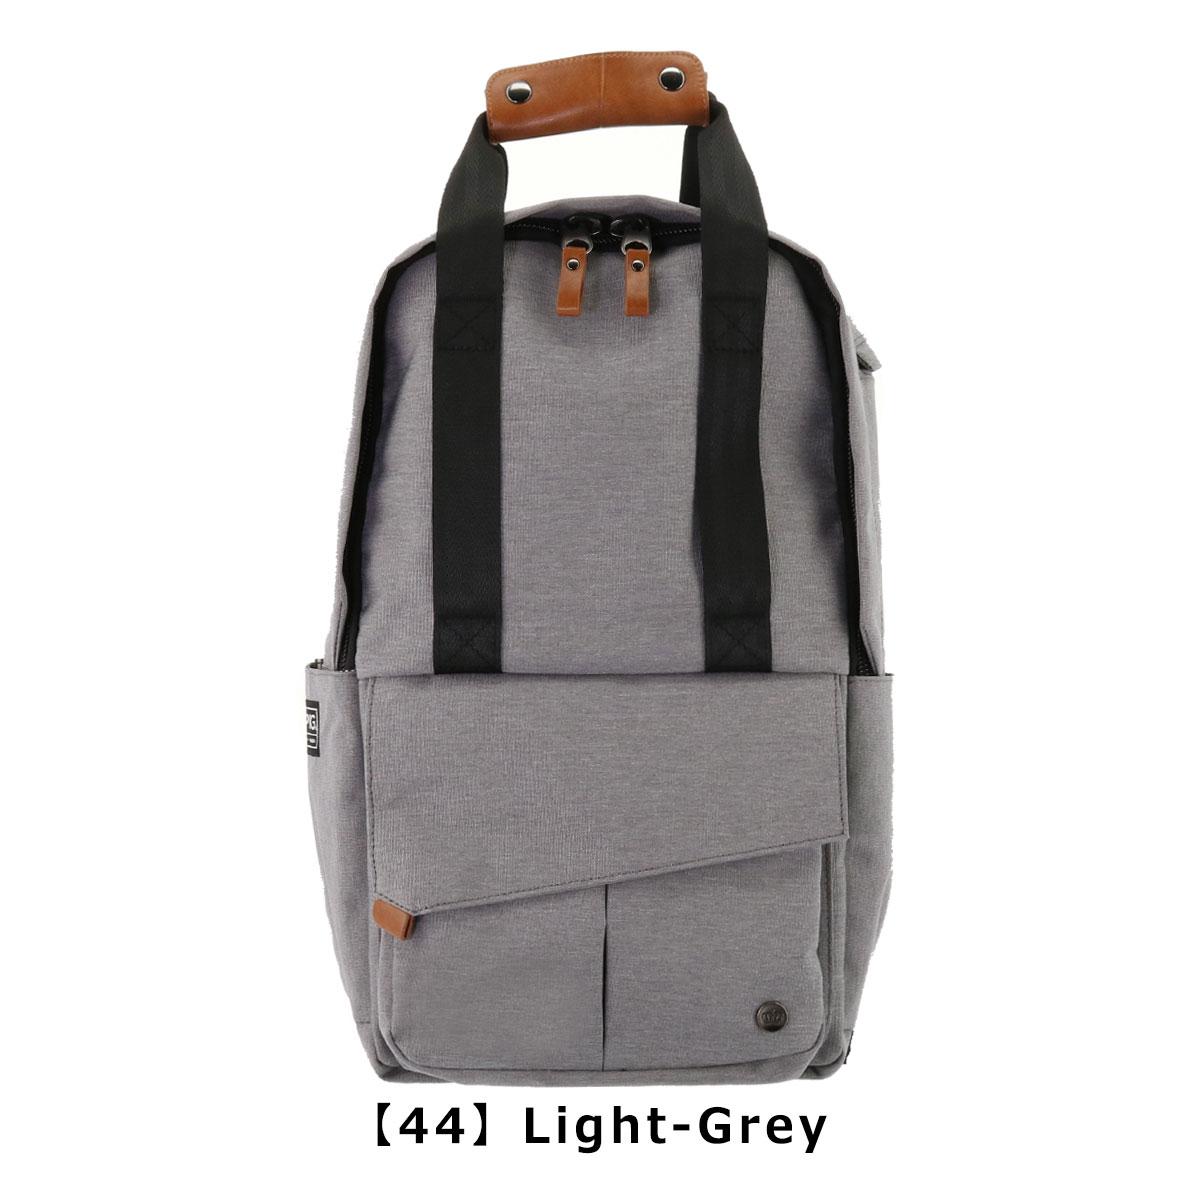 【44】Light-Grey